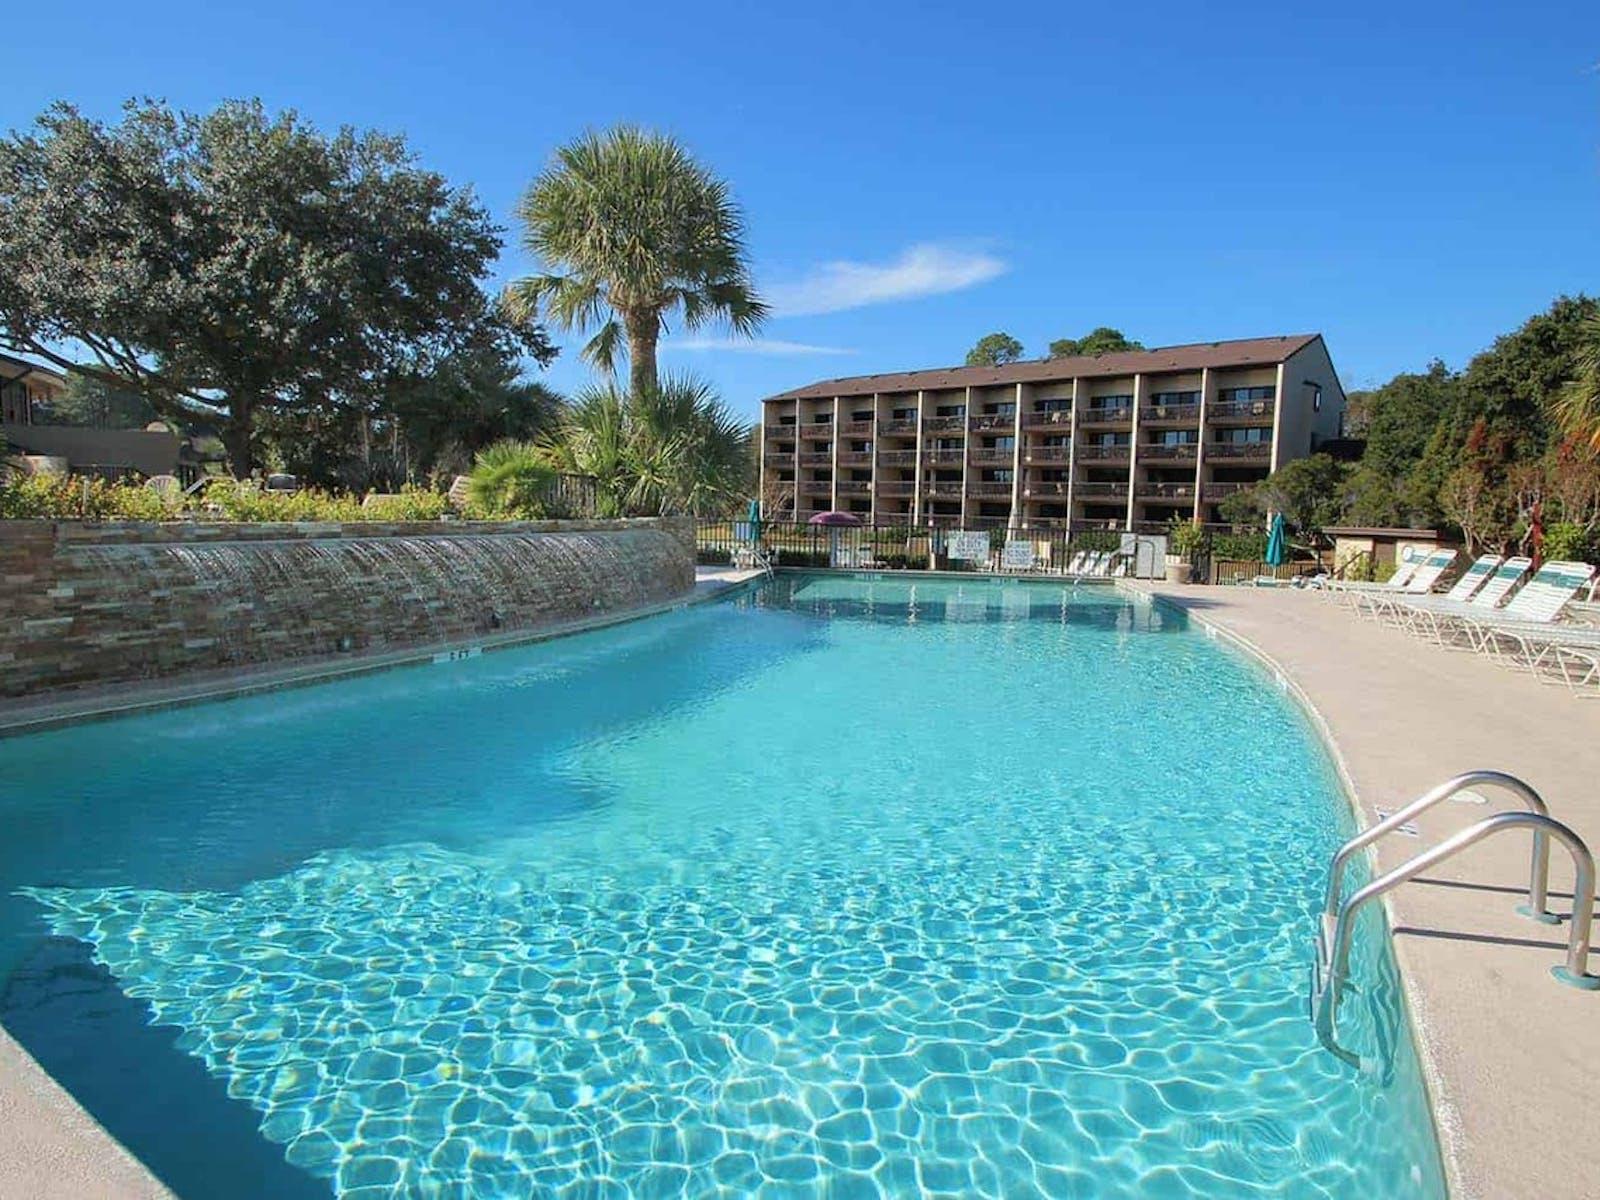 resort pool located in hilton head